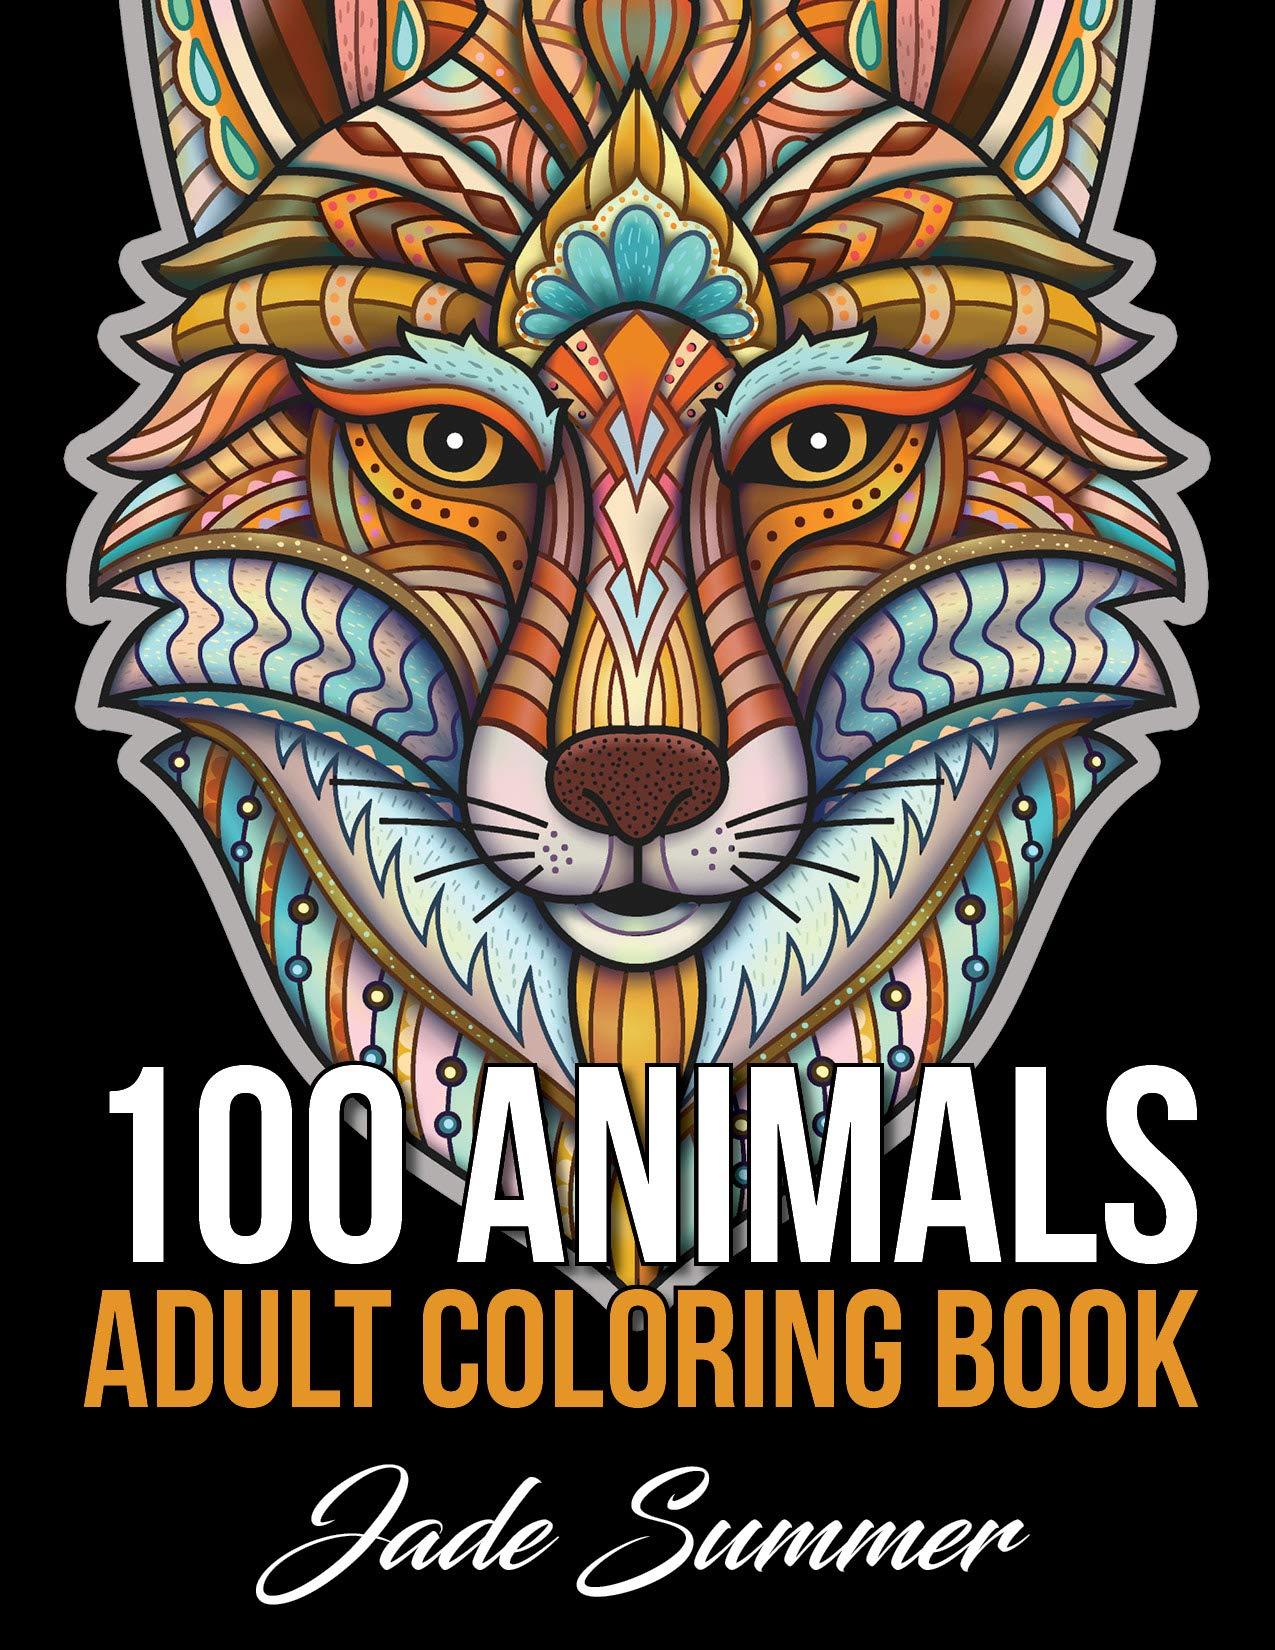 100 Animals Coloring Elephants Horses product image